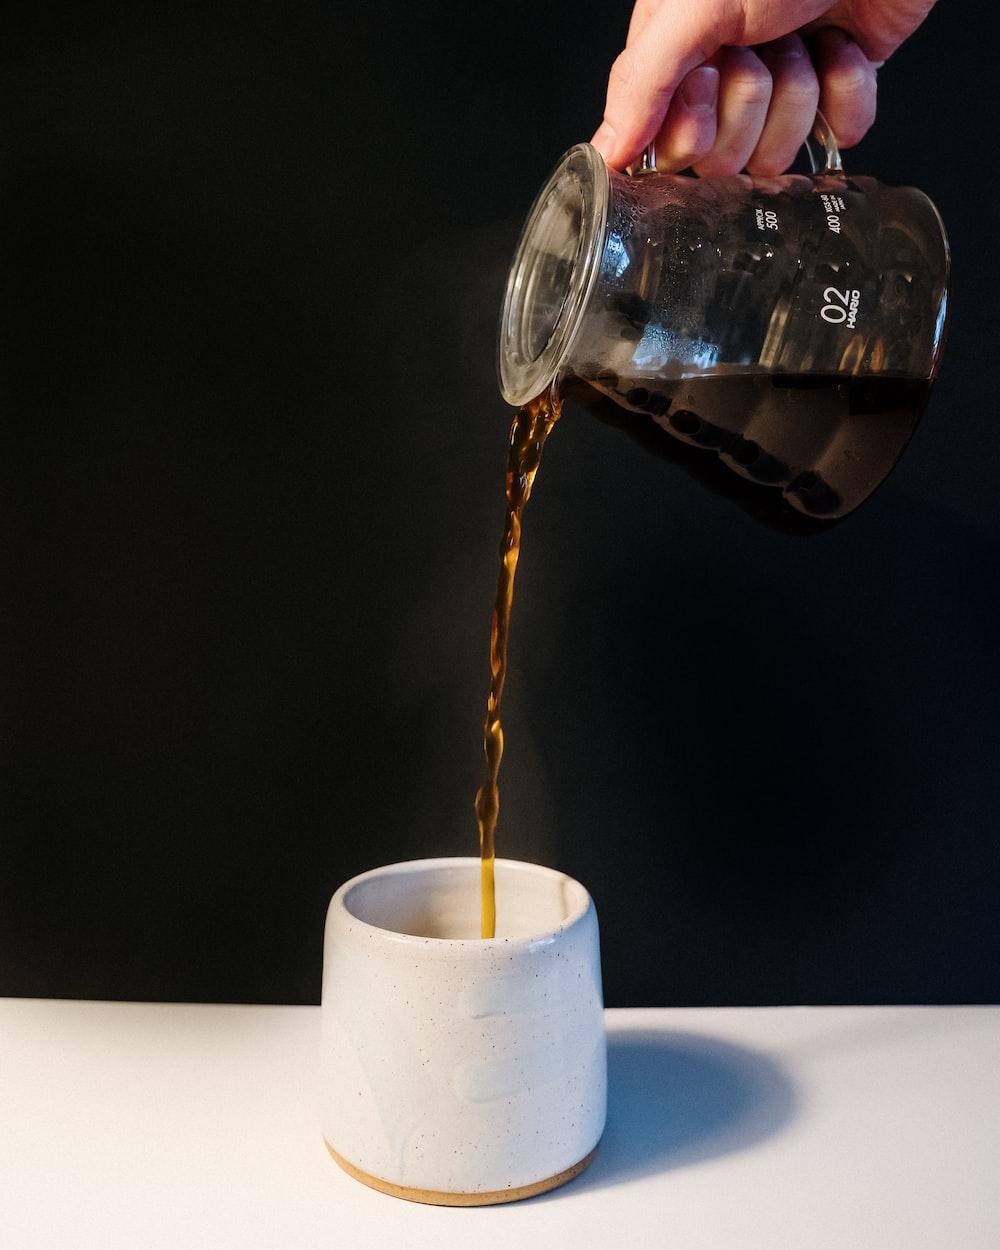 clear glass mug on white tissue paper